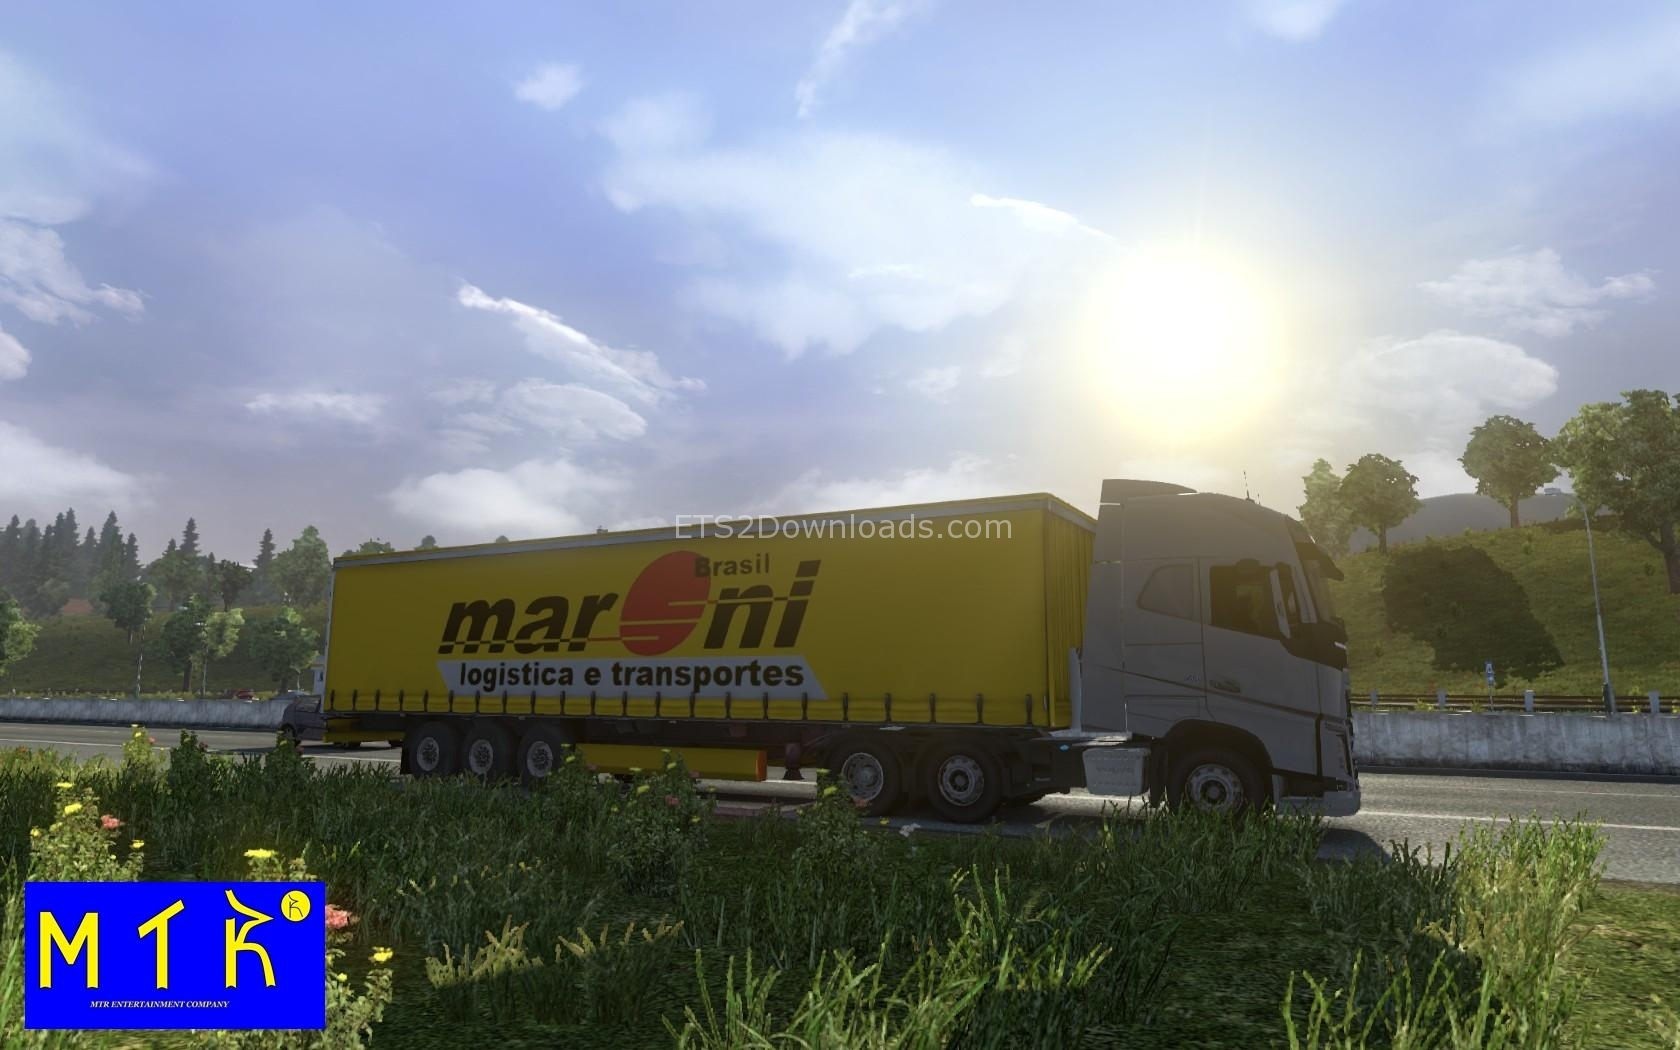 maroni-transportes-trailer